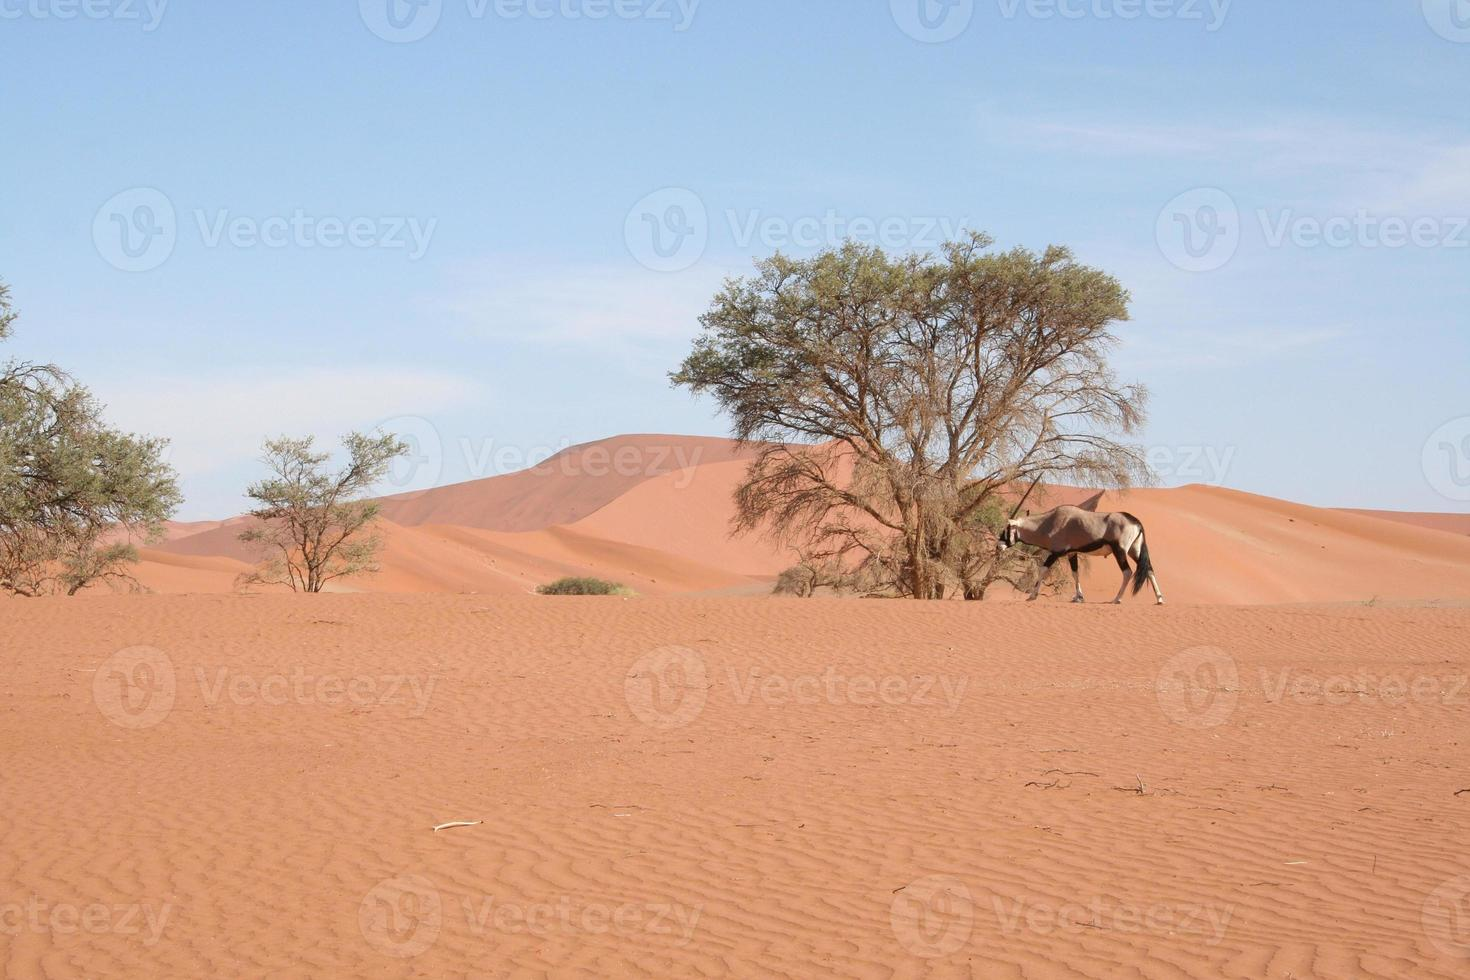 Oryx in the Dunes of Sossusvlei, Namib Desert, Namibia, Africa photo